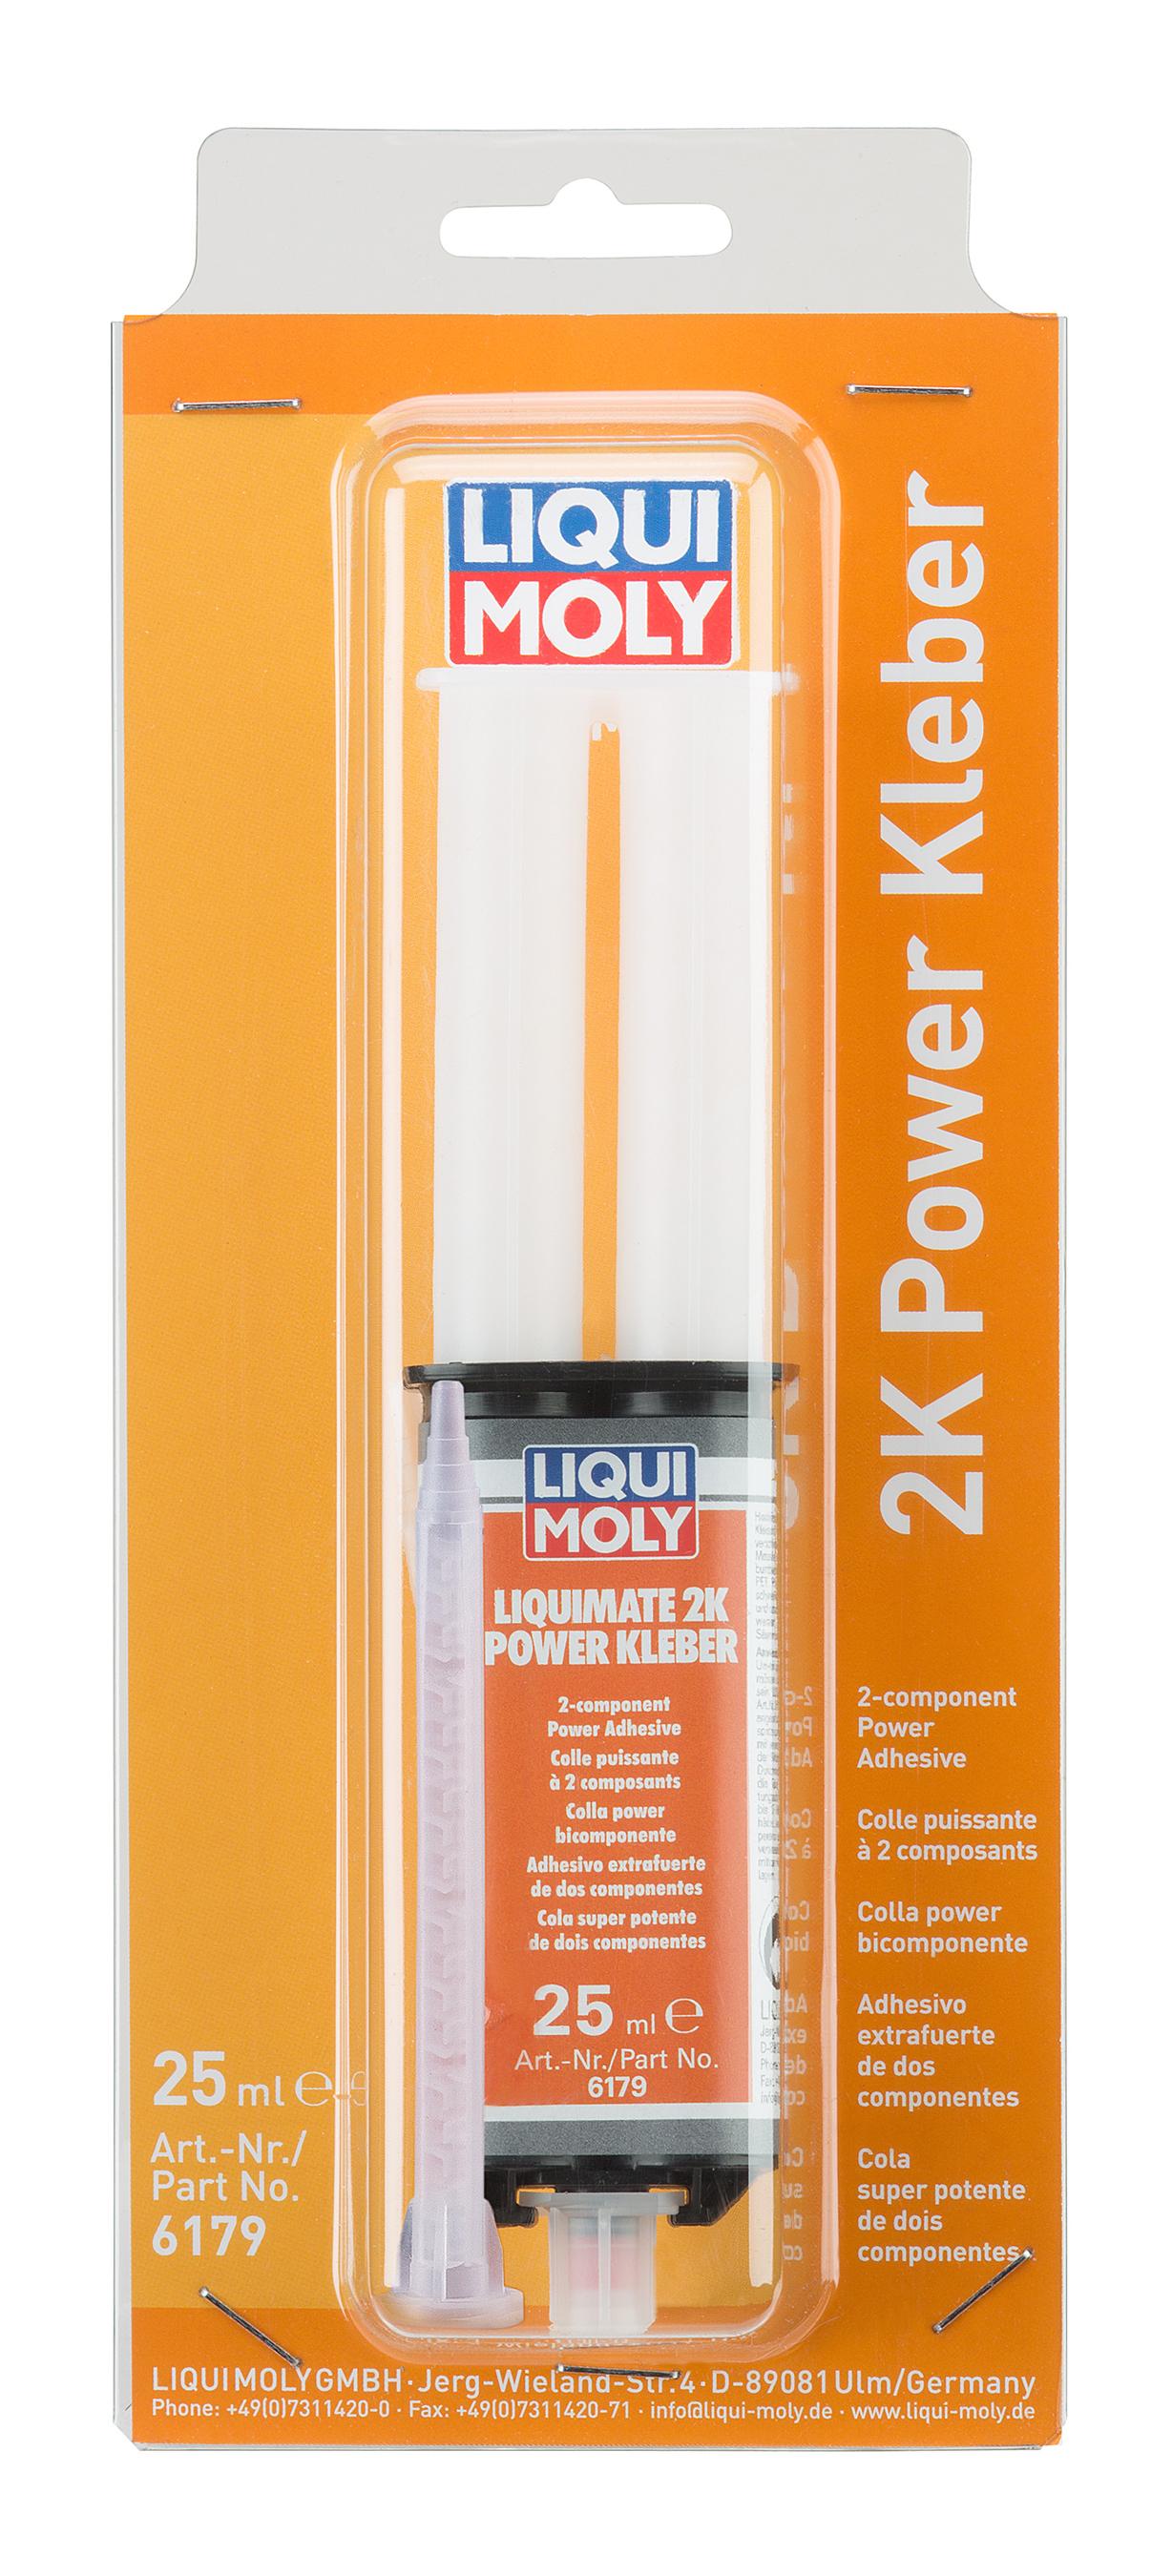 Liqui Moly Liquimate 2K Power Kleber 25ml Bild 1